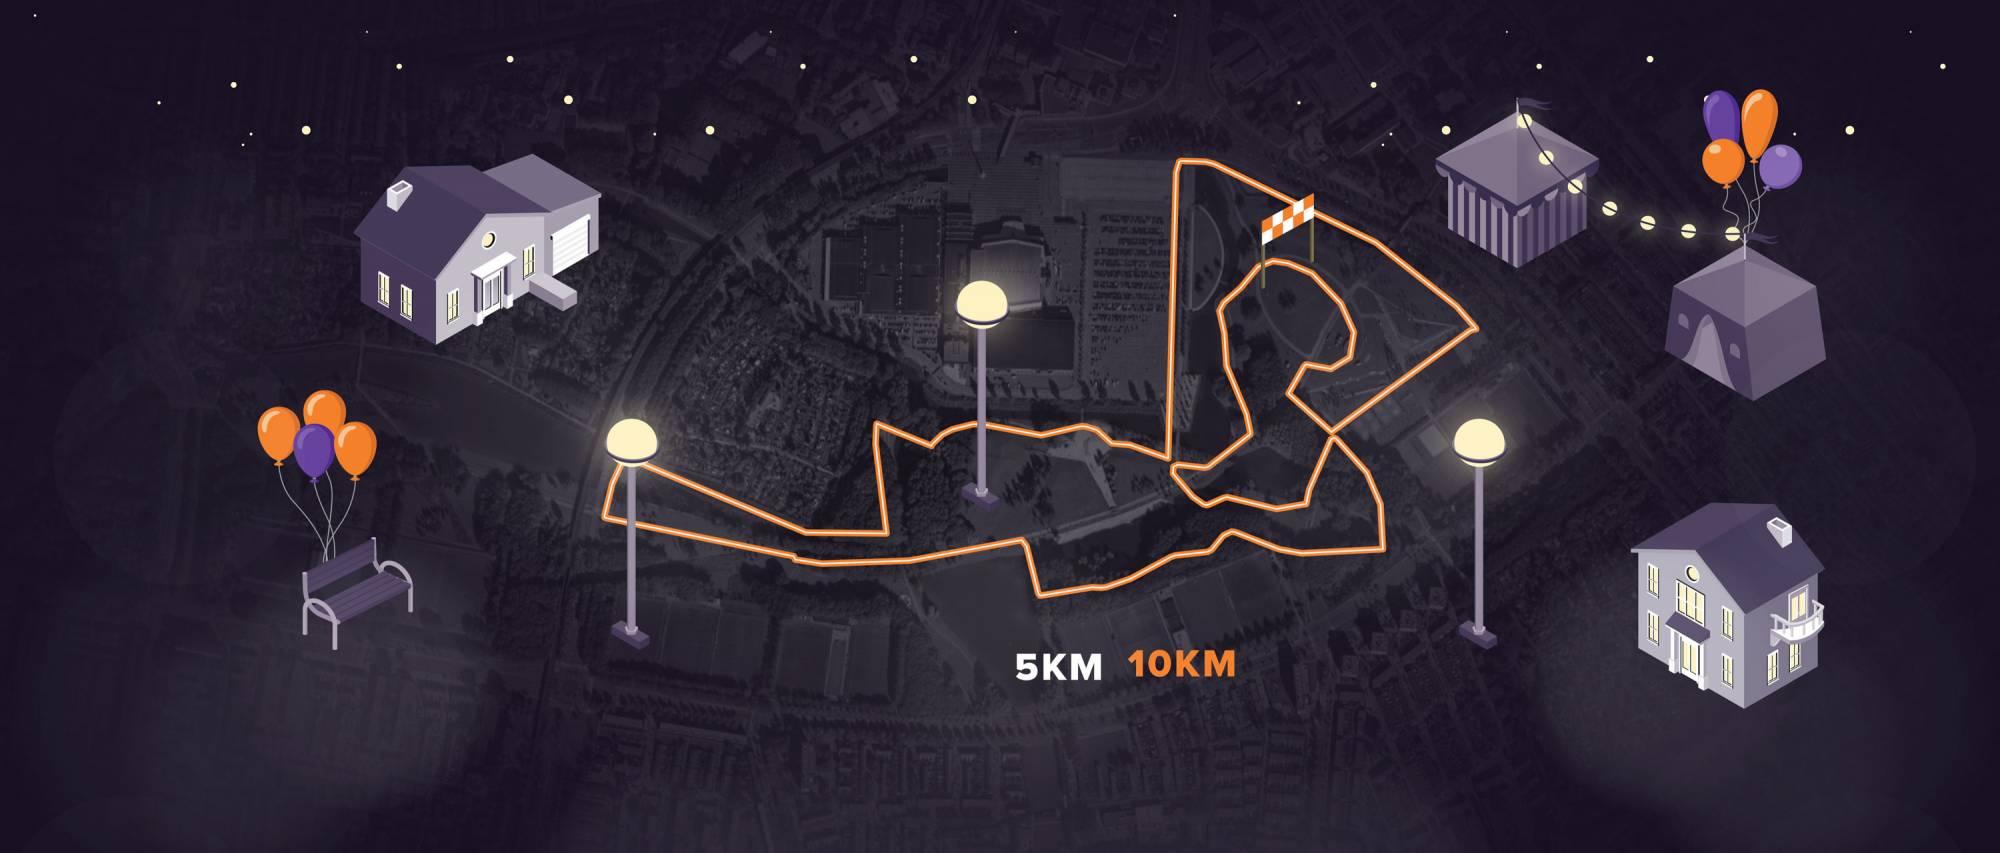 Afbeelding van de 10 kilometer, 5 kilometer en 1 kilometer KidsRun route van de Run for KiKa Nightrun op 18 april 2019 in het Zuiderpark in Rotterdam